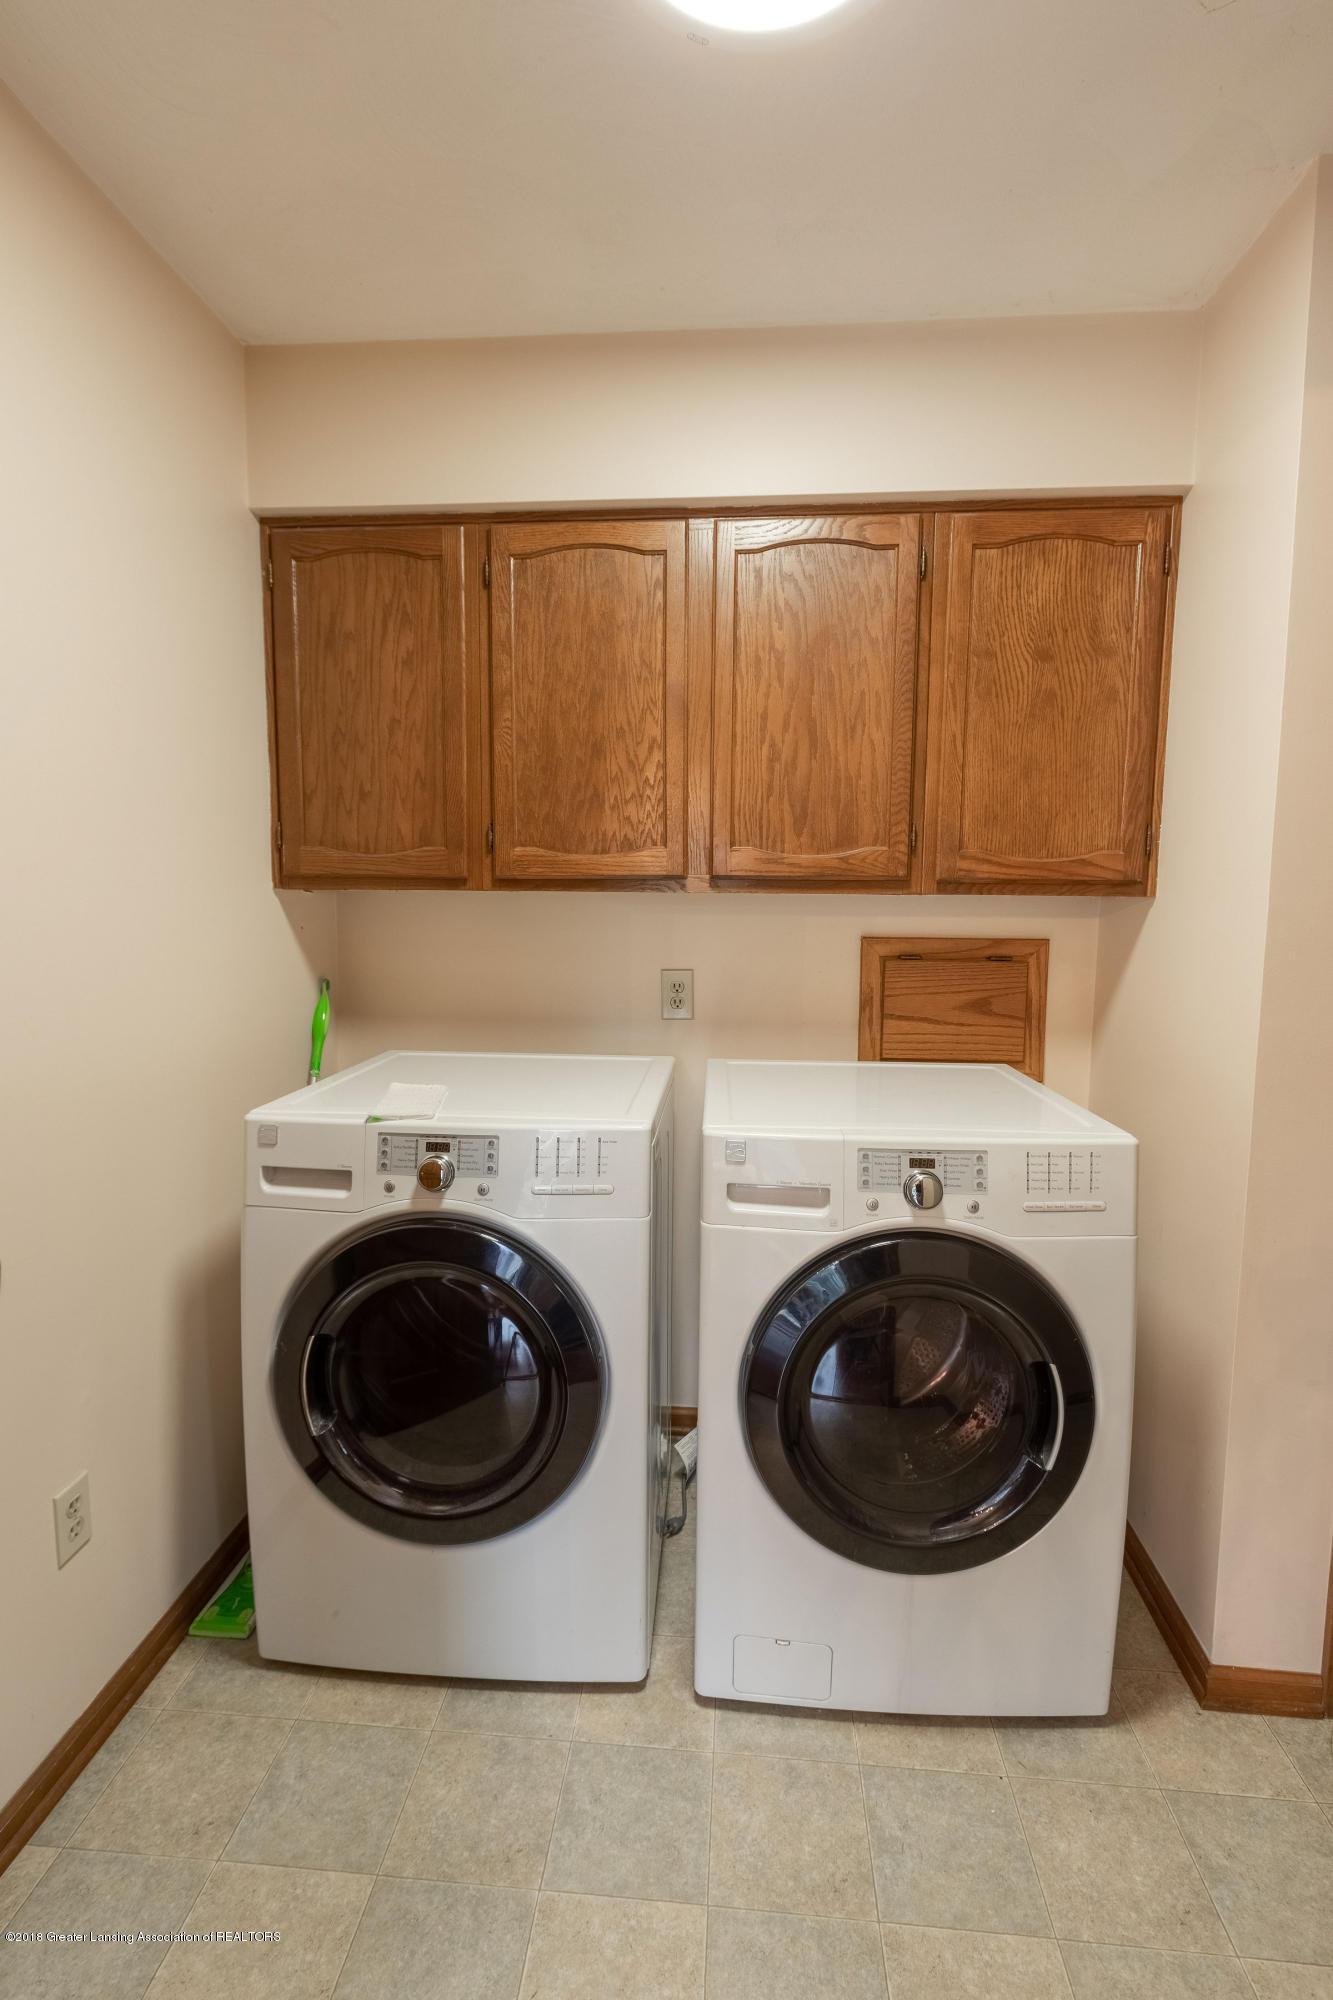 3981 Breckinridge Dr - Main Floor Laundry - 26